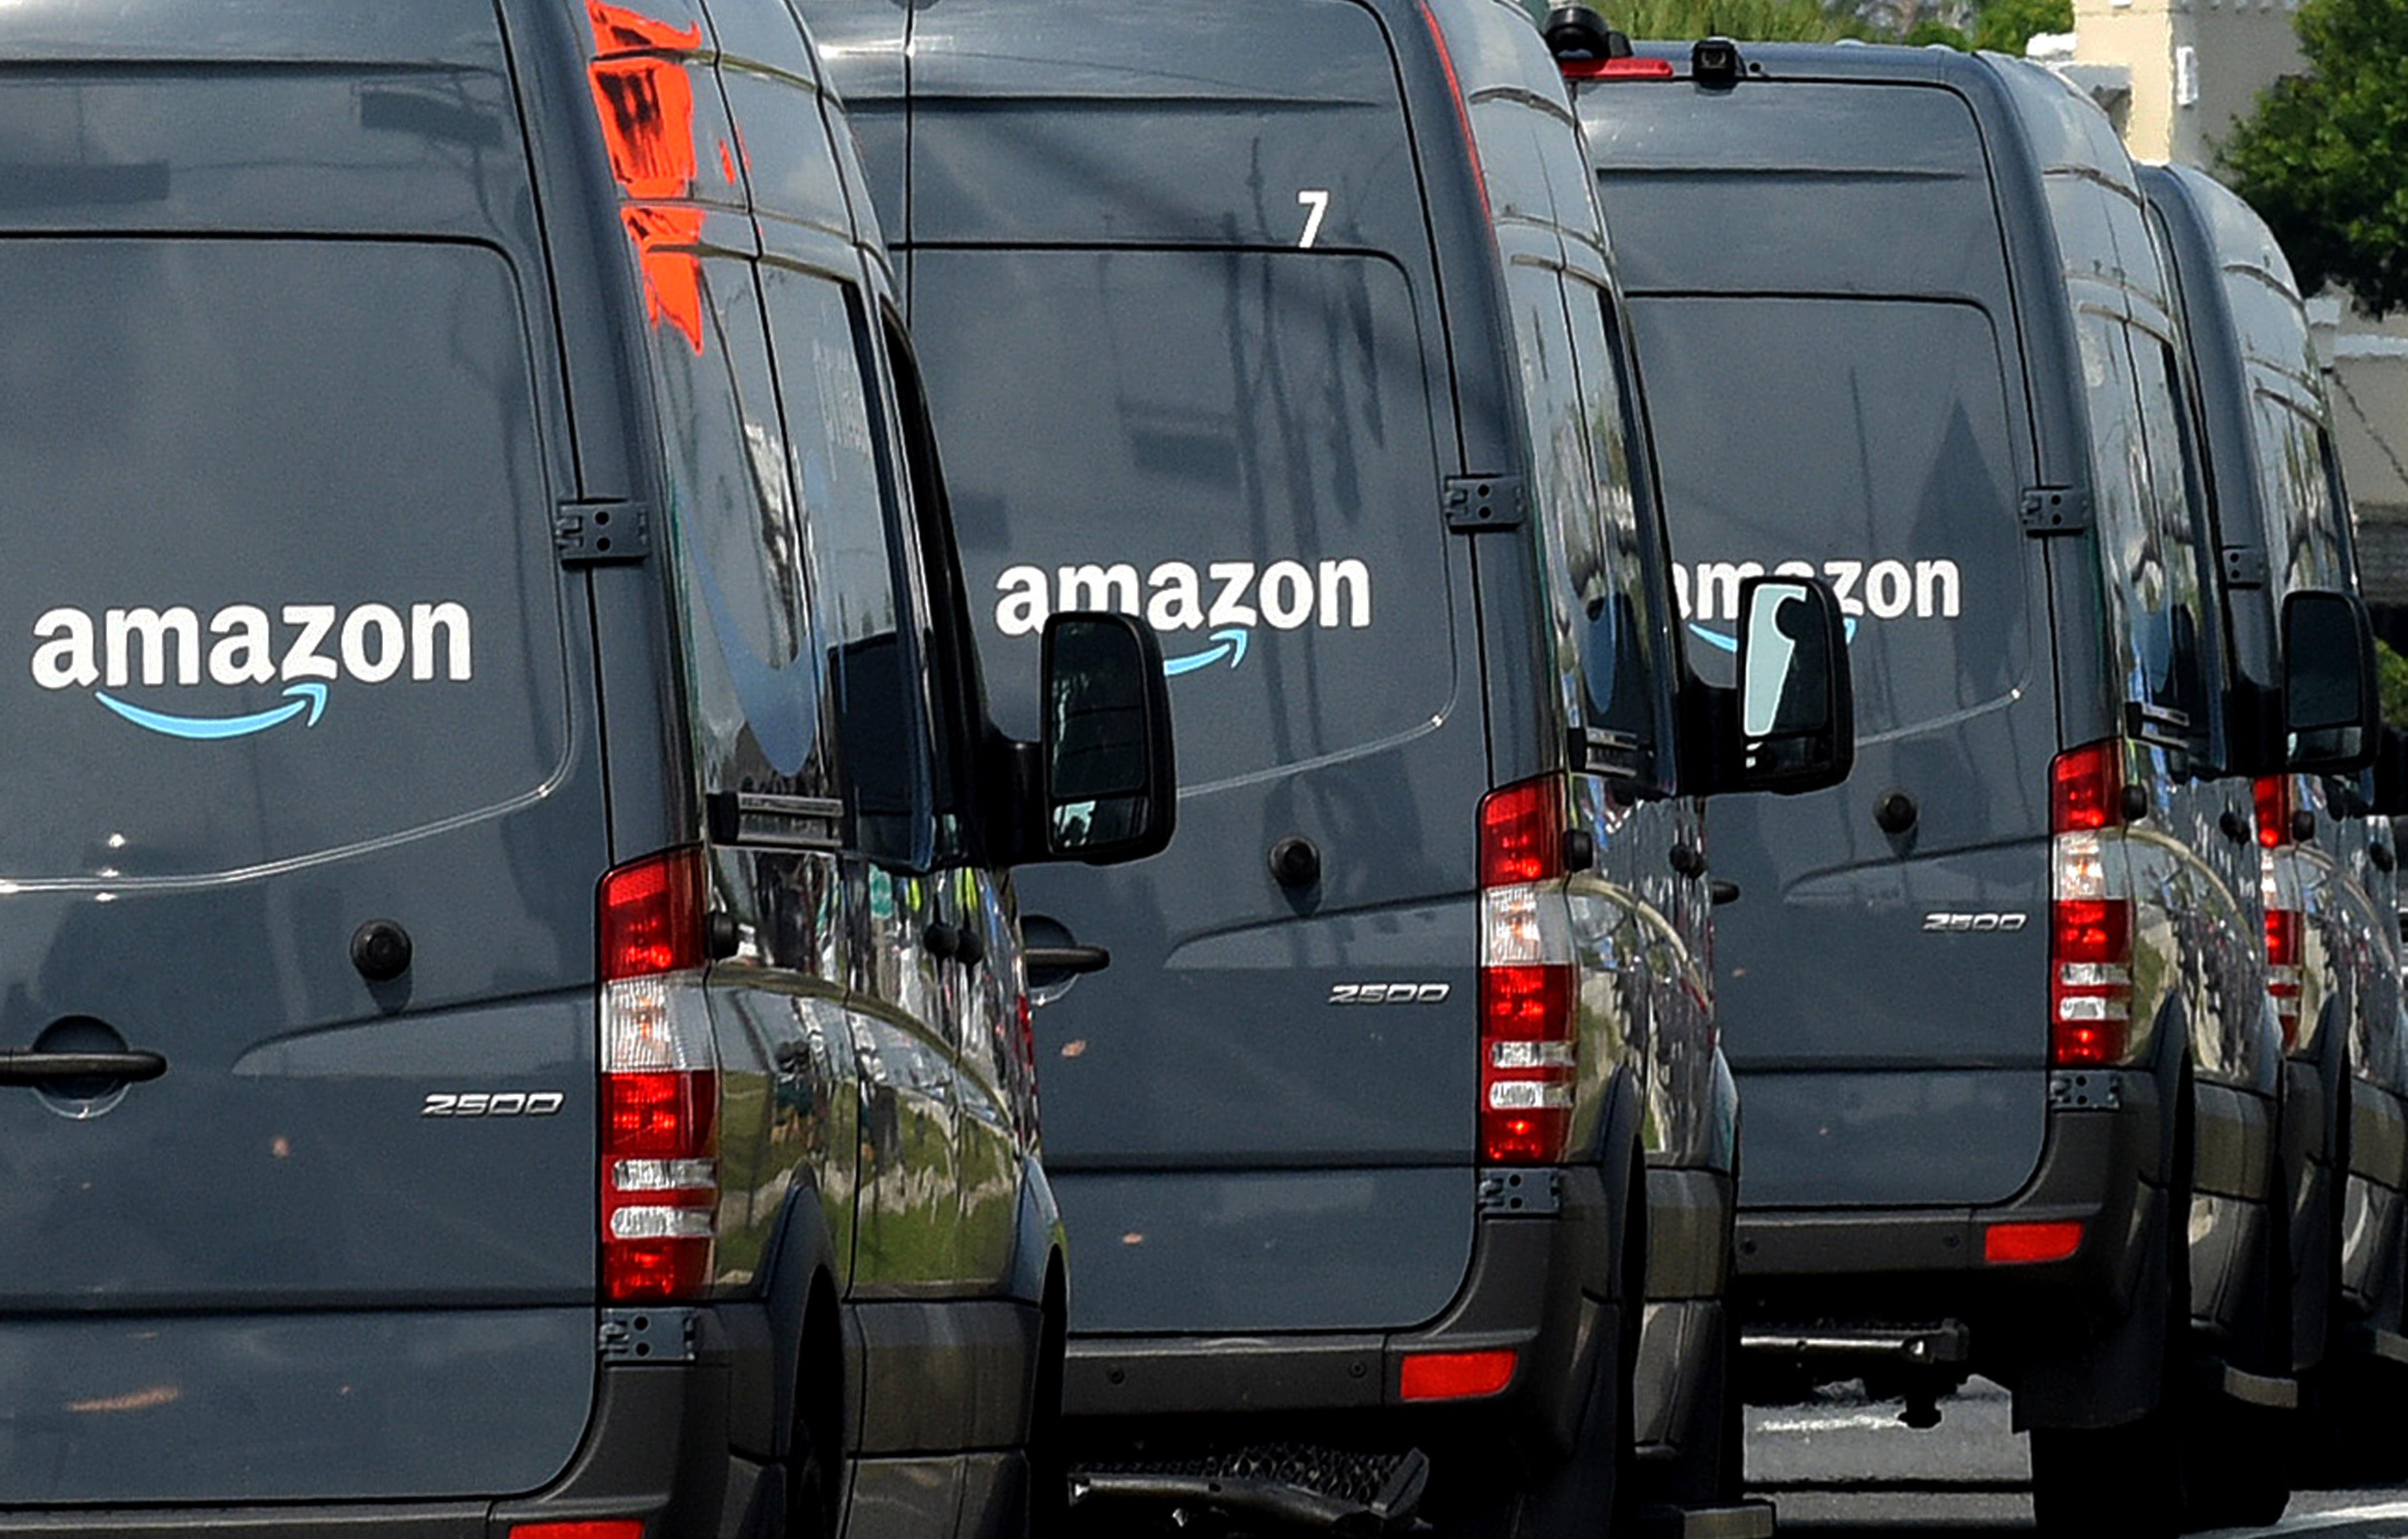 Amazon Vans